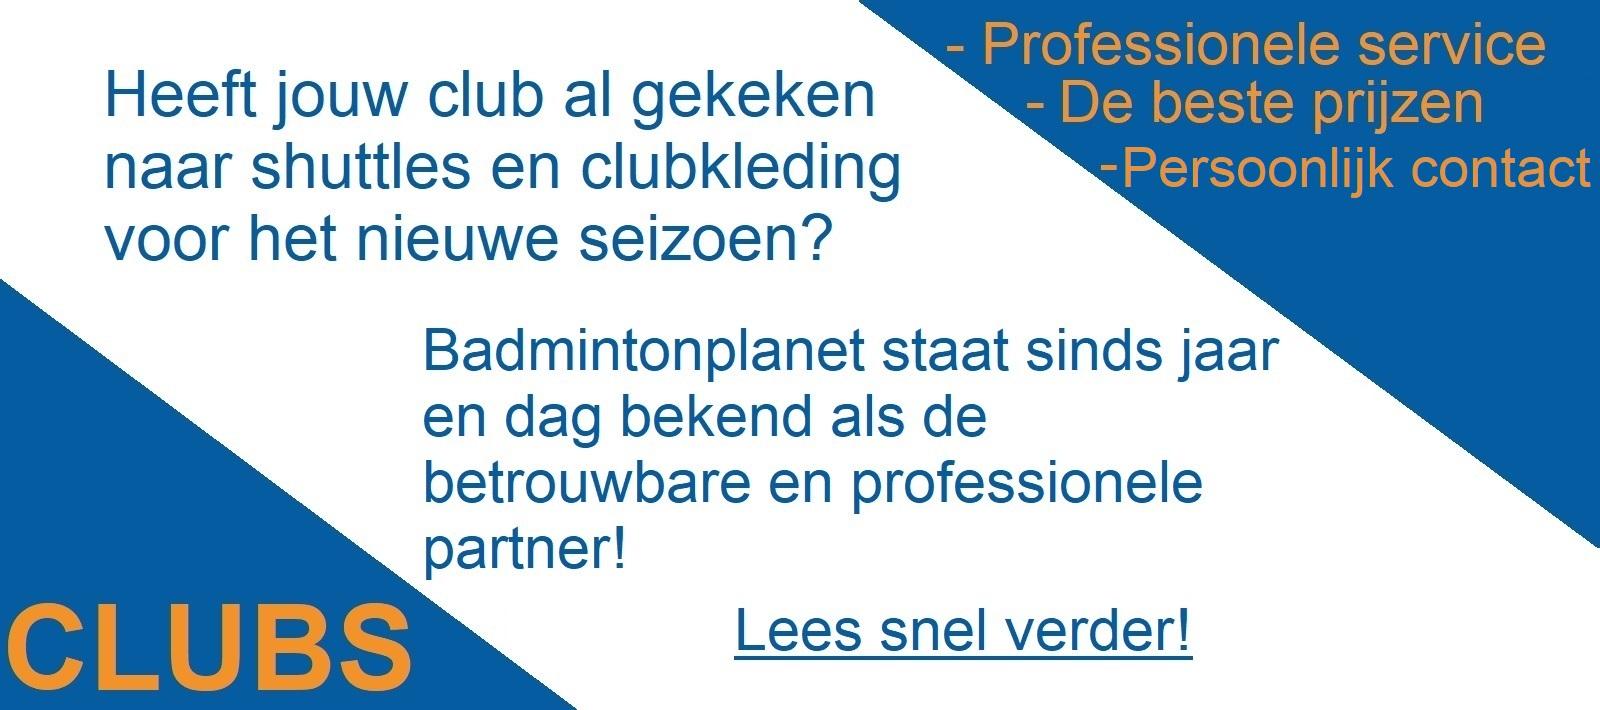 Clubs en Badmintonplanet